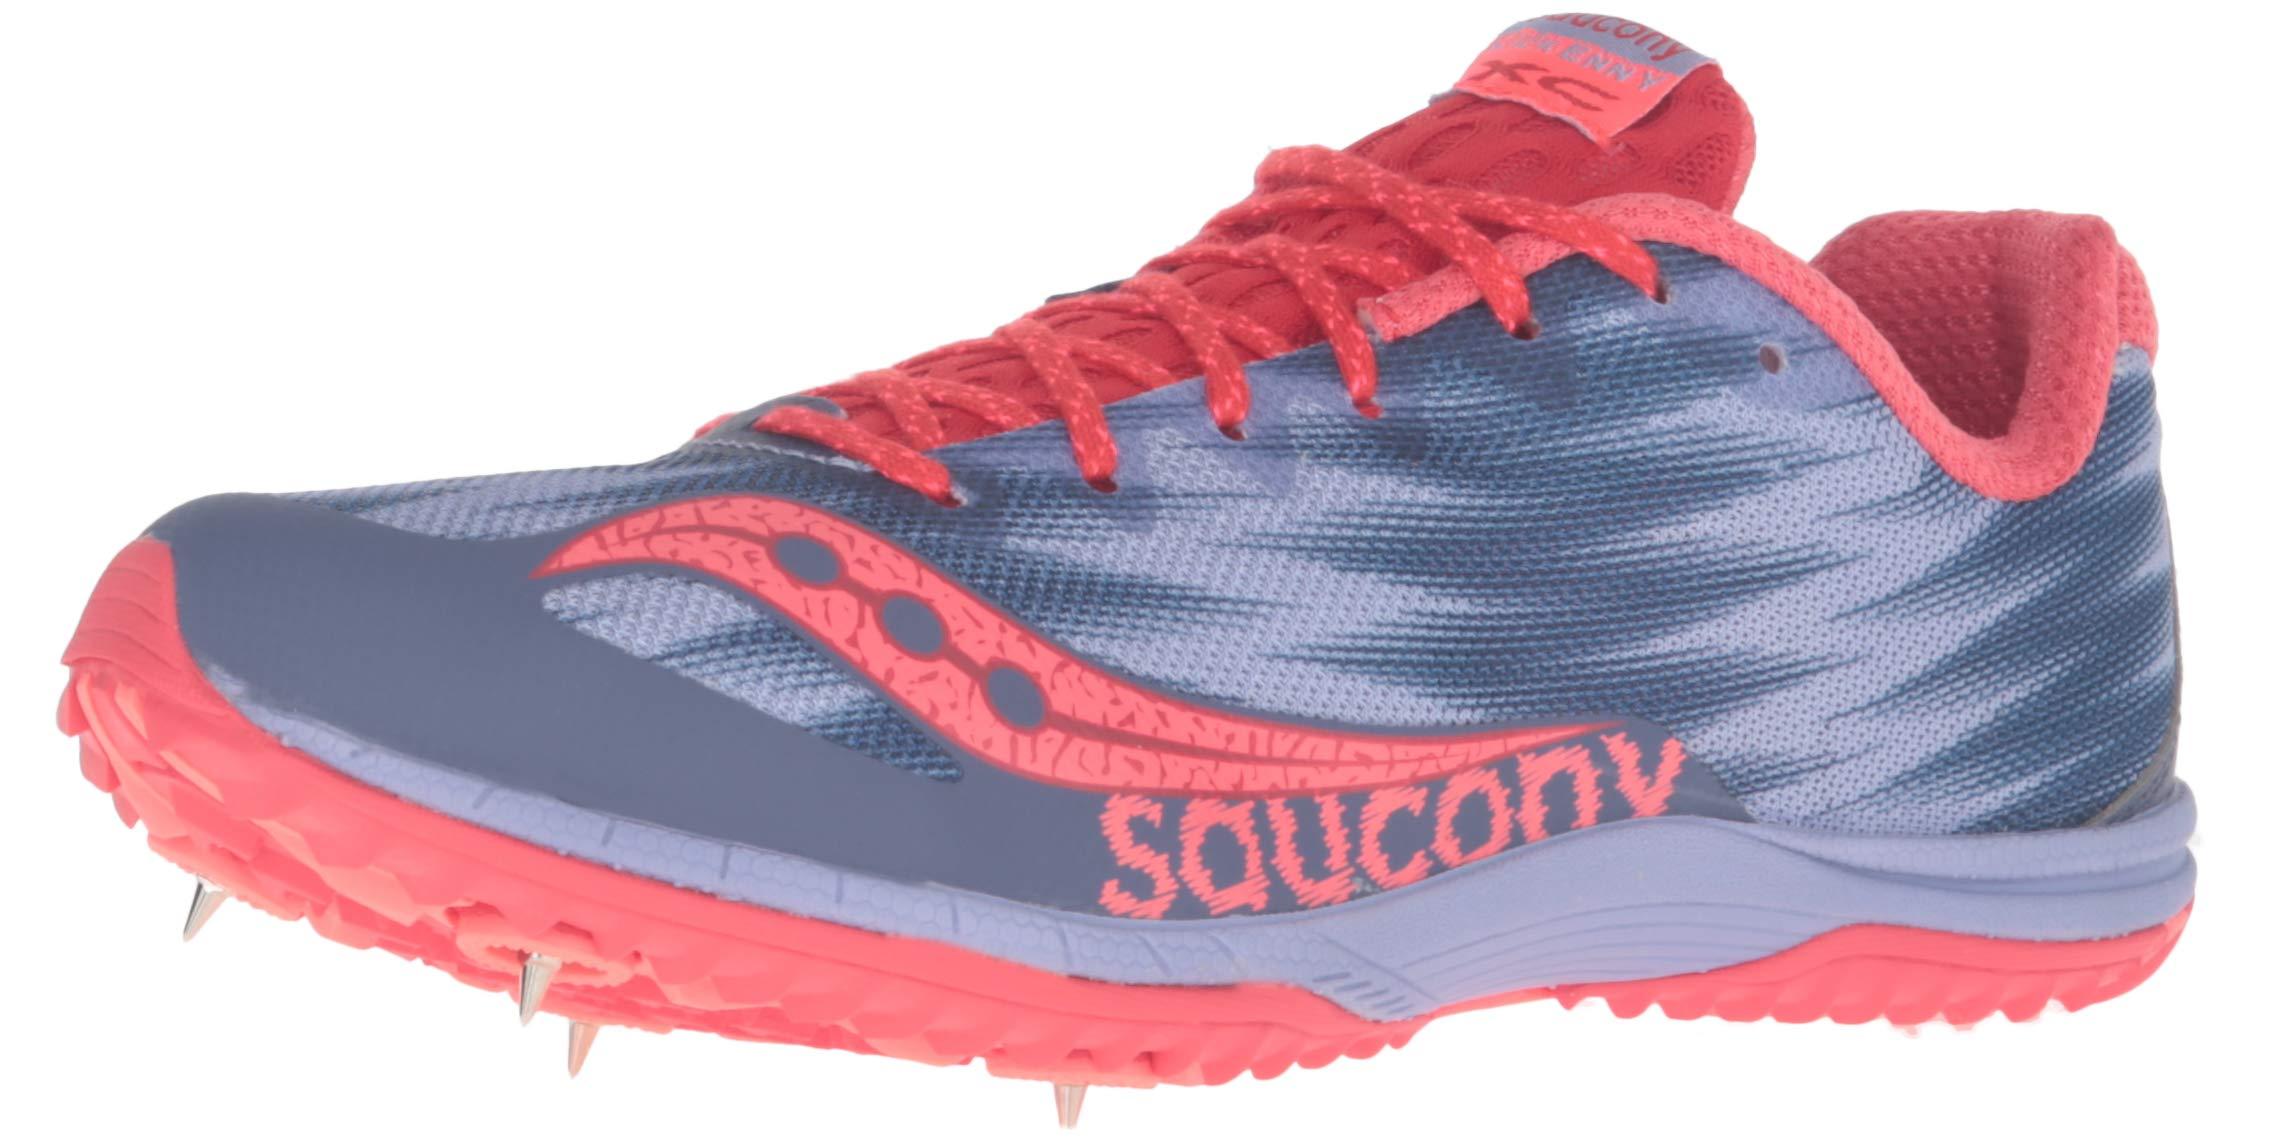 Saucony Women's Kilkenny XC5 Cross-Country Shoe